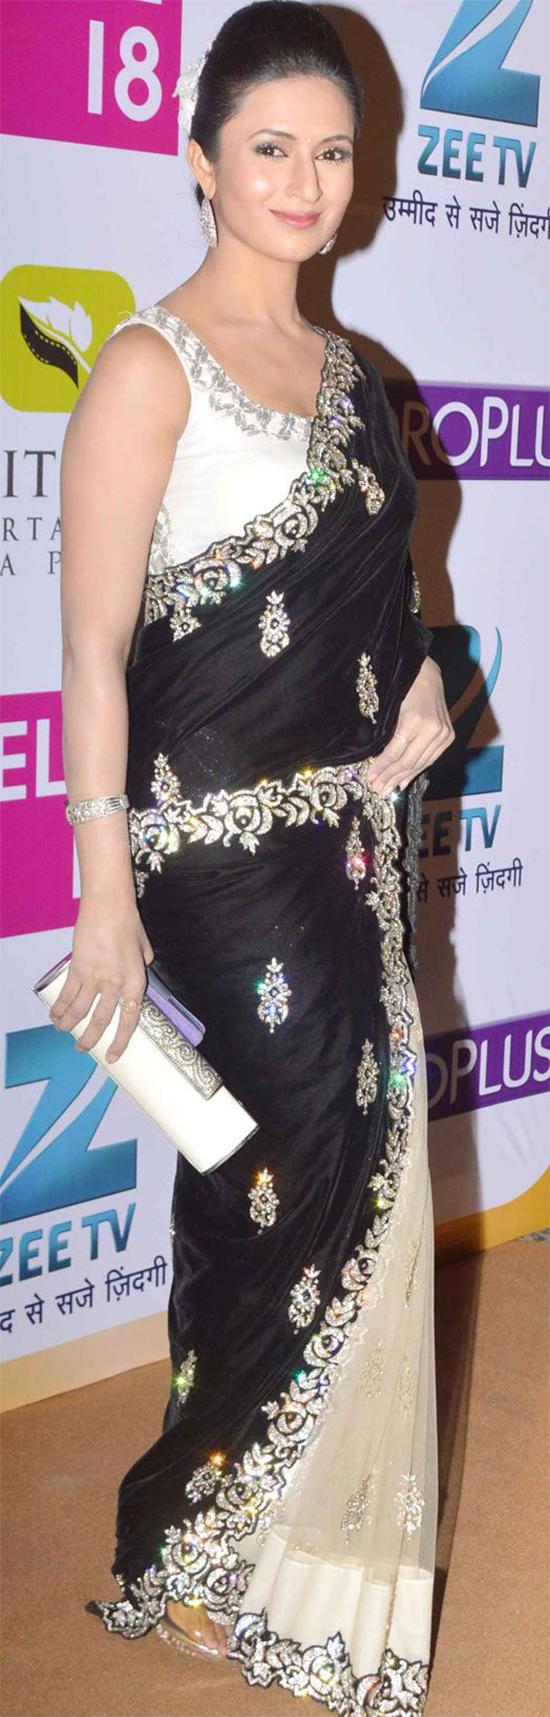 Divyanka Tripathi In Off White And Black Net Saree